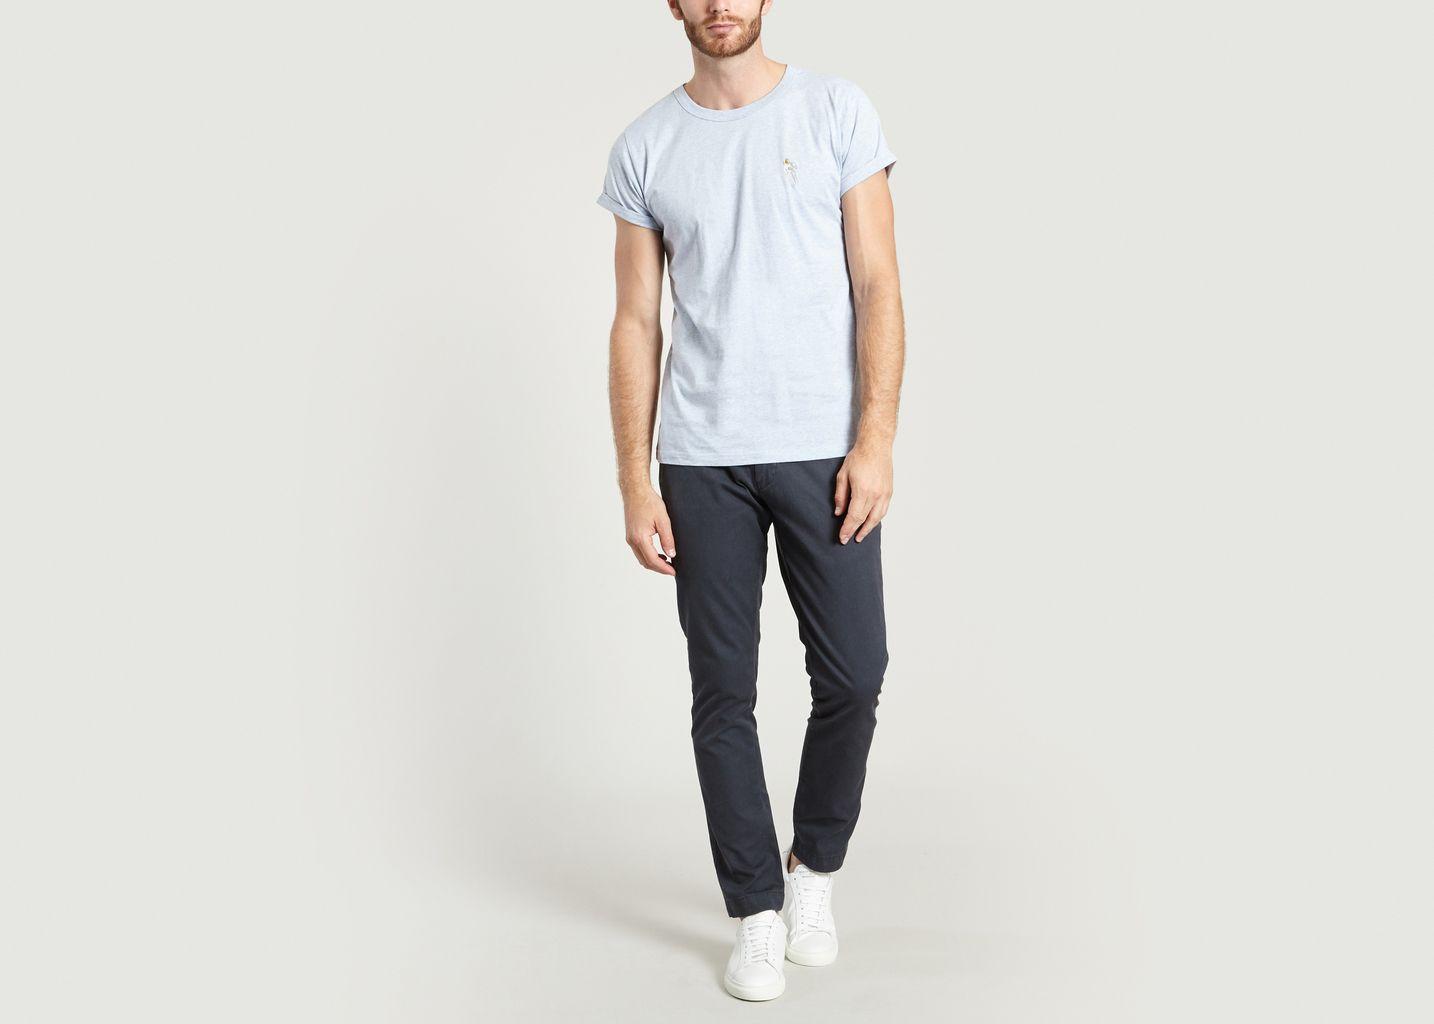 T-Shirt Cosmonaute - Maison Labiche